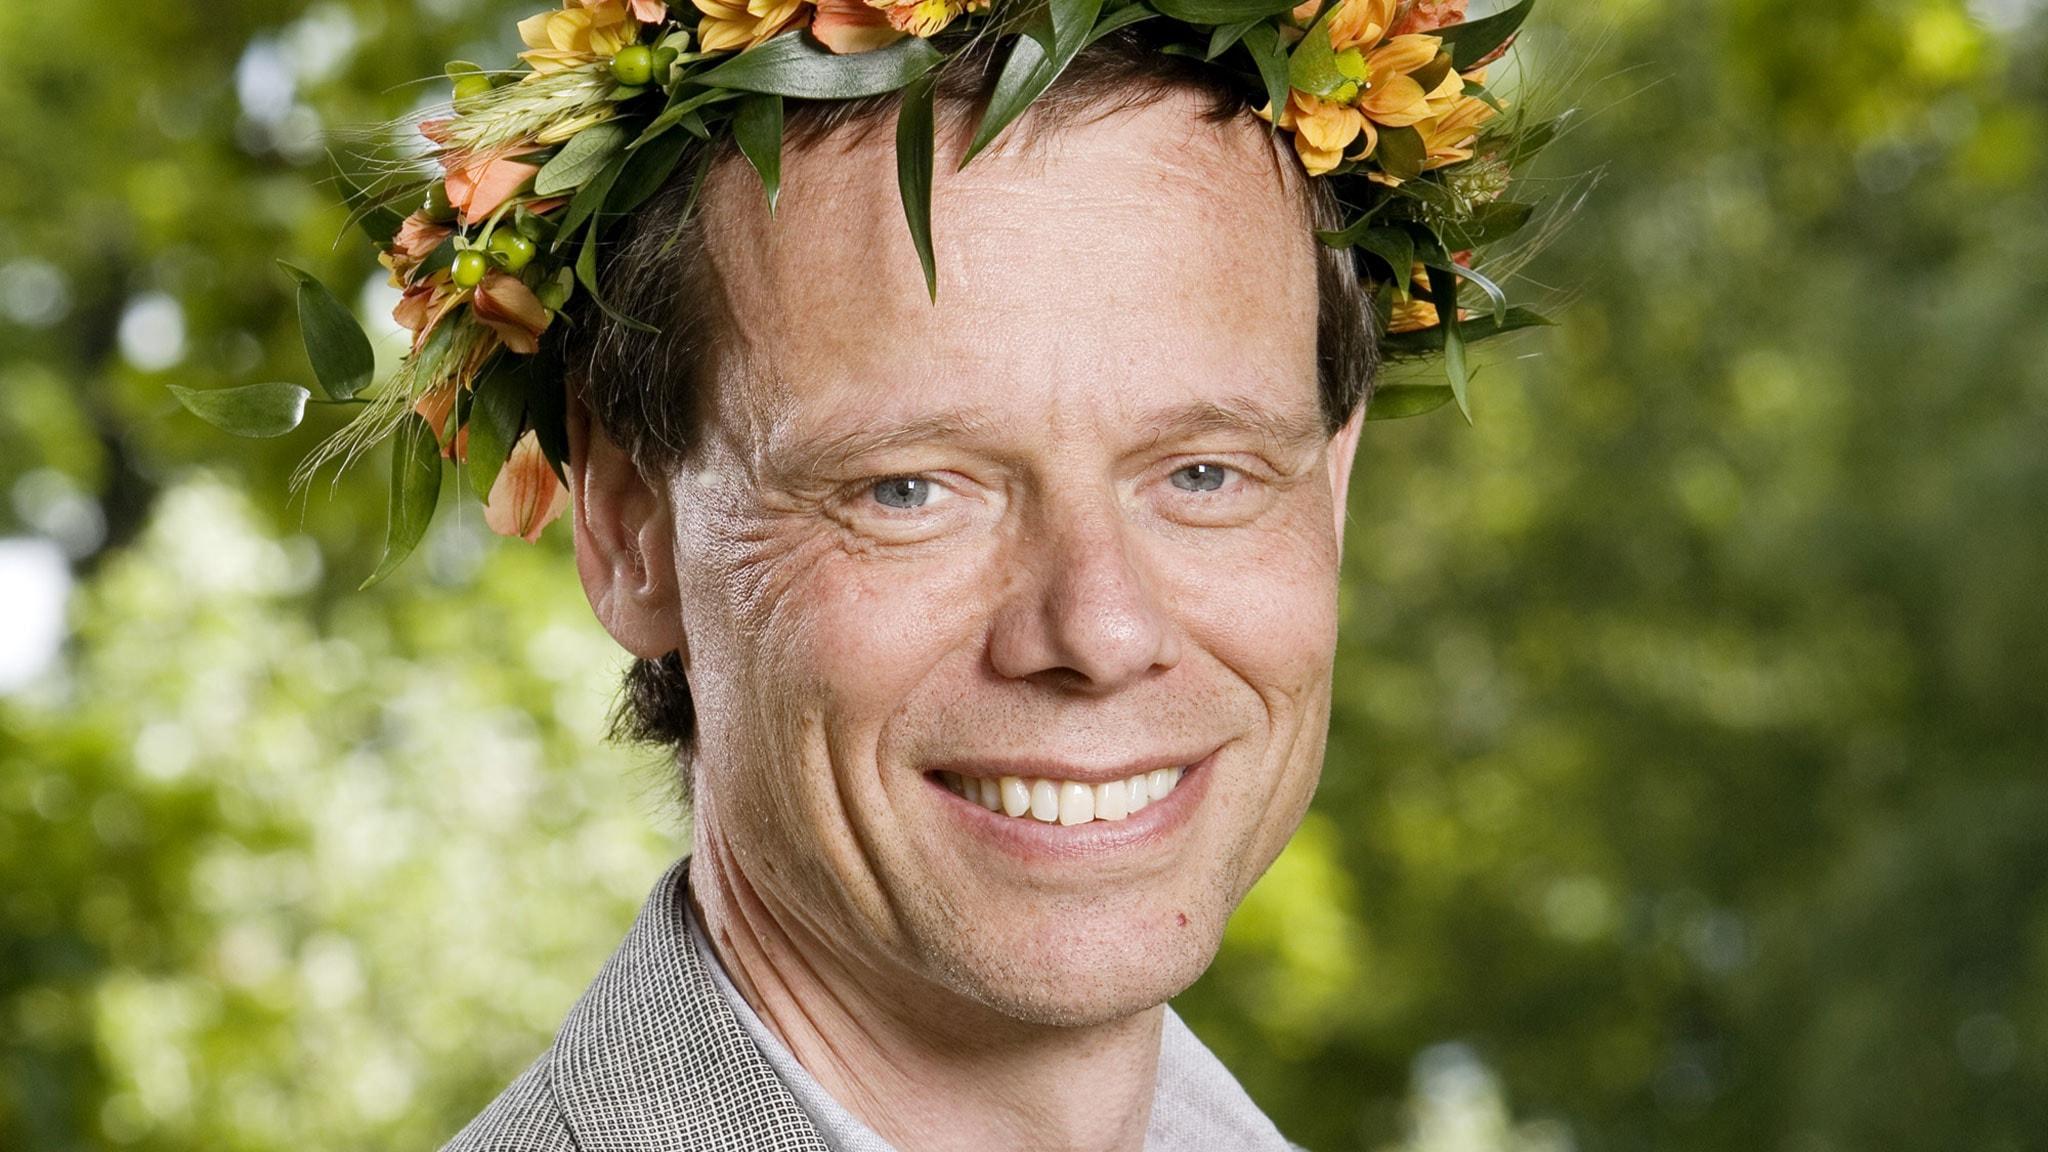 Christer Fuglesang. Mattias Ahlm/SR